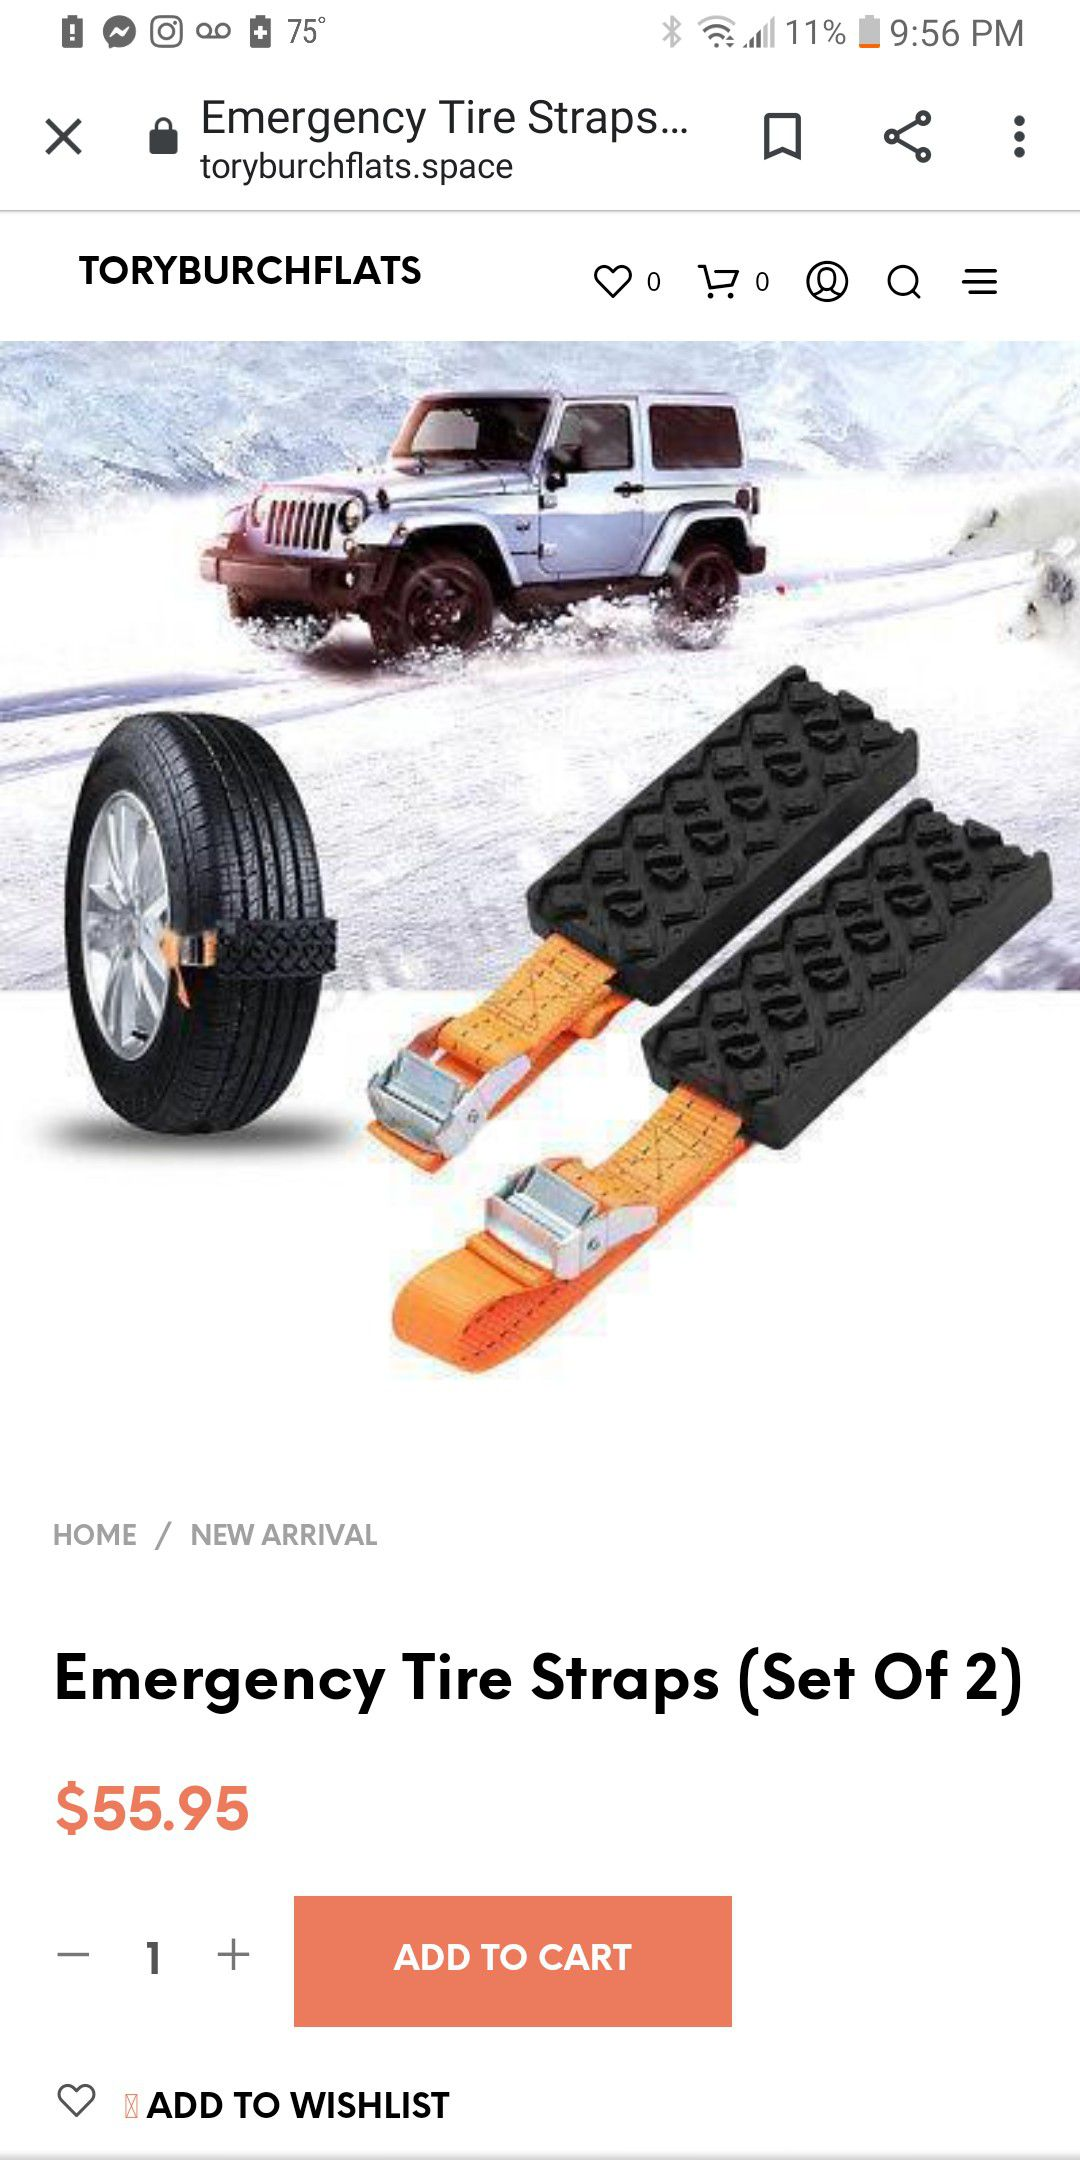 Emergency tire straps